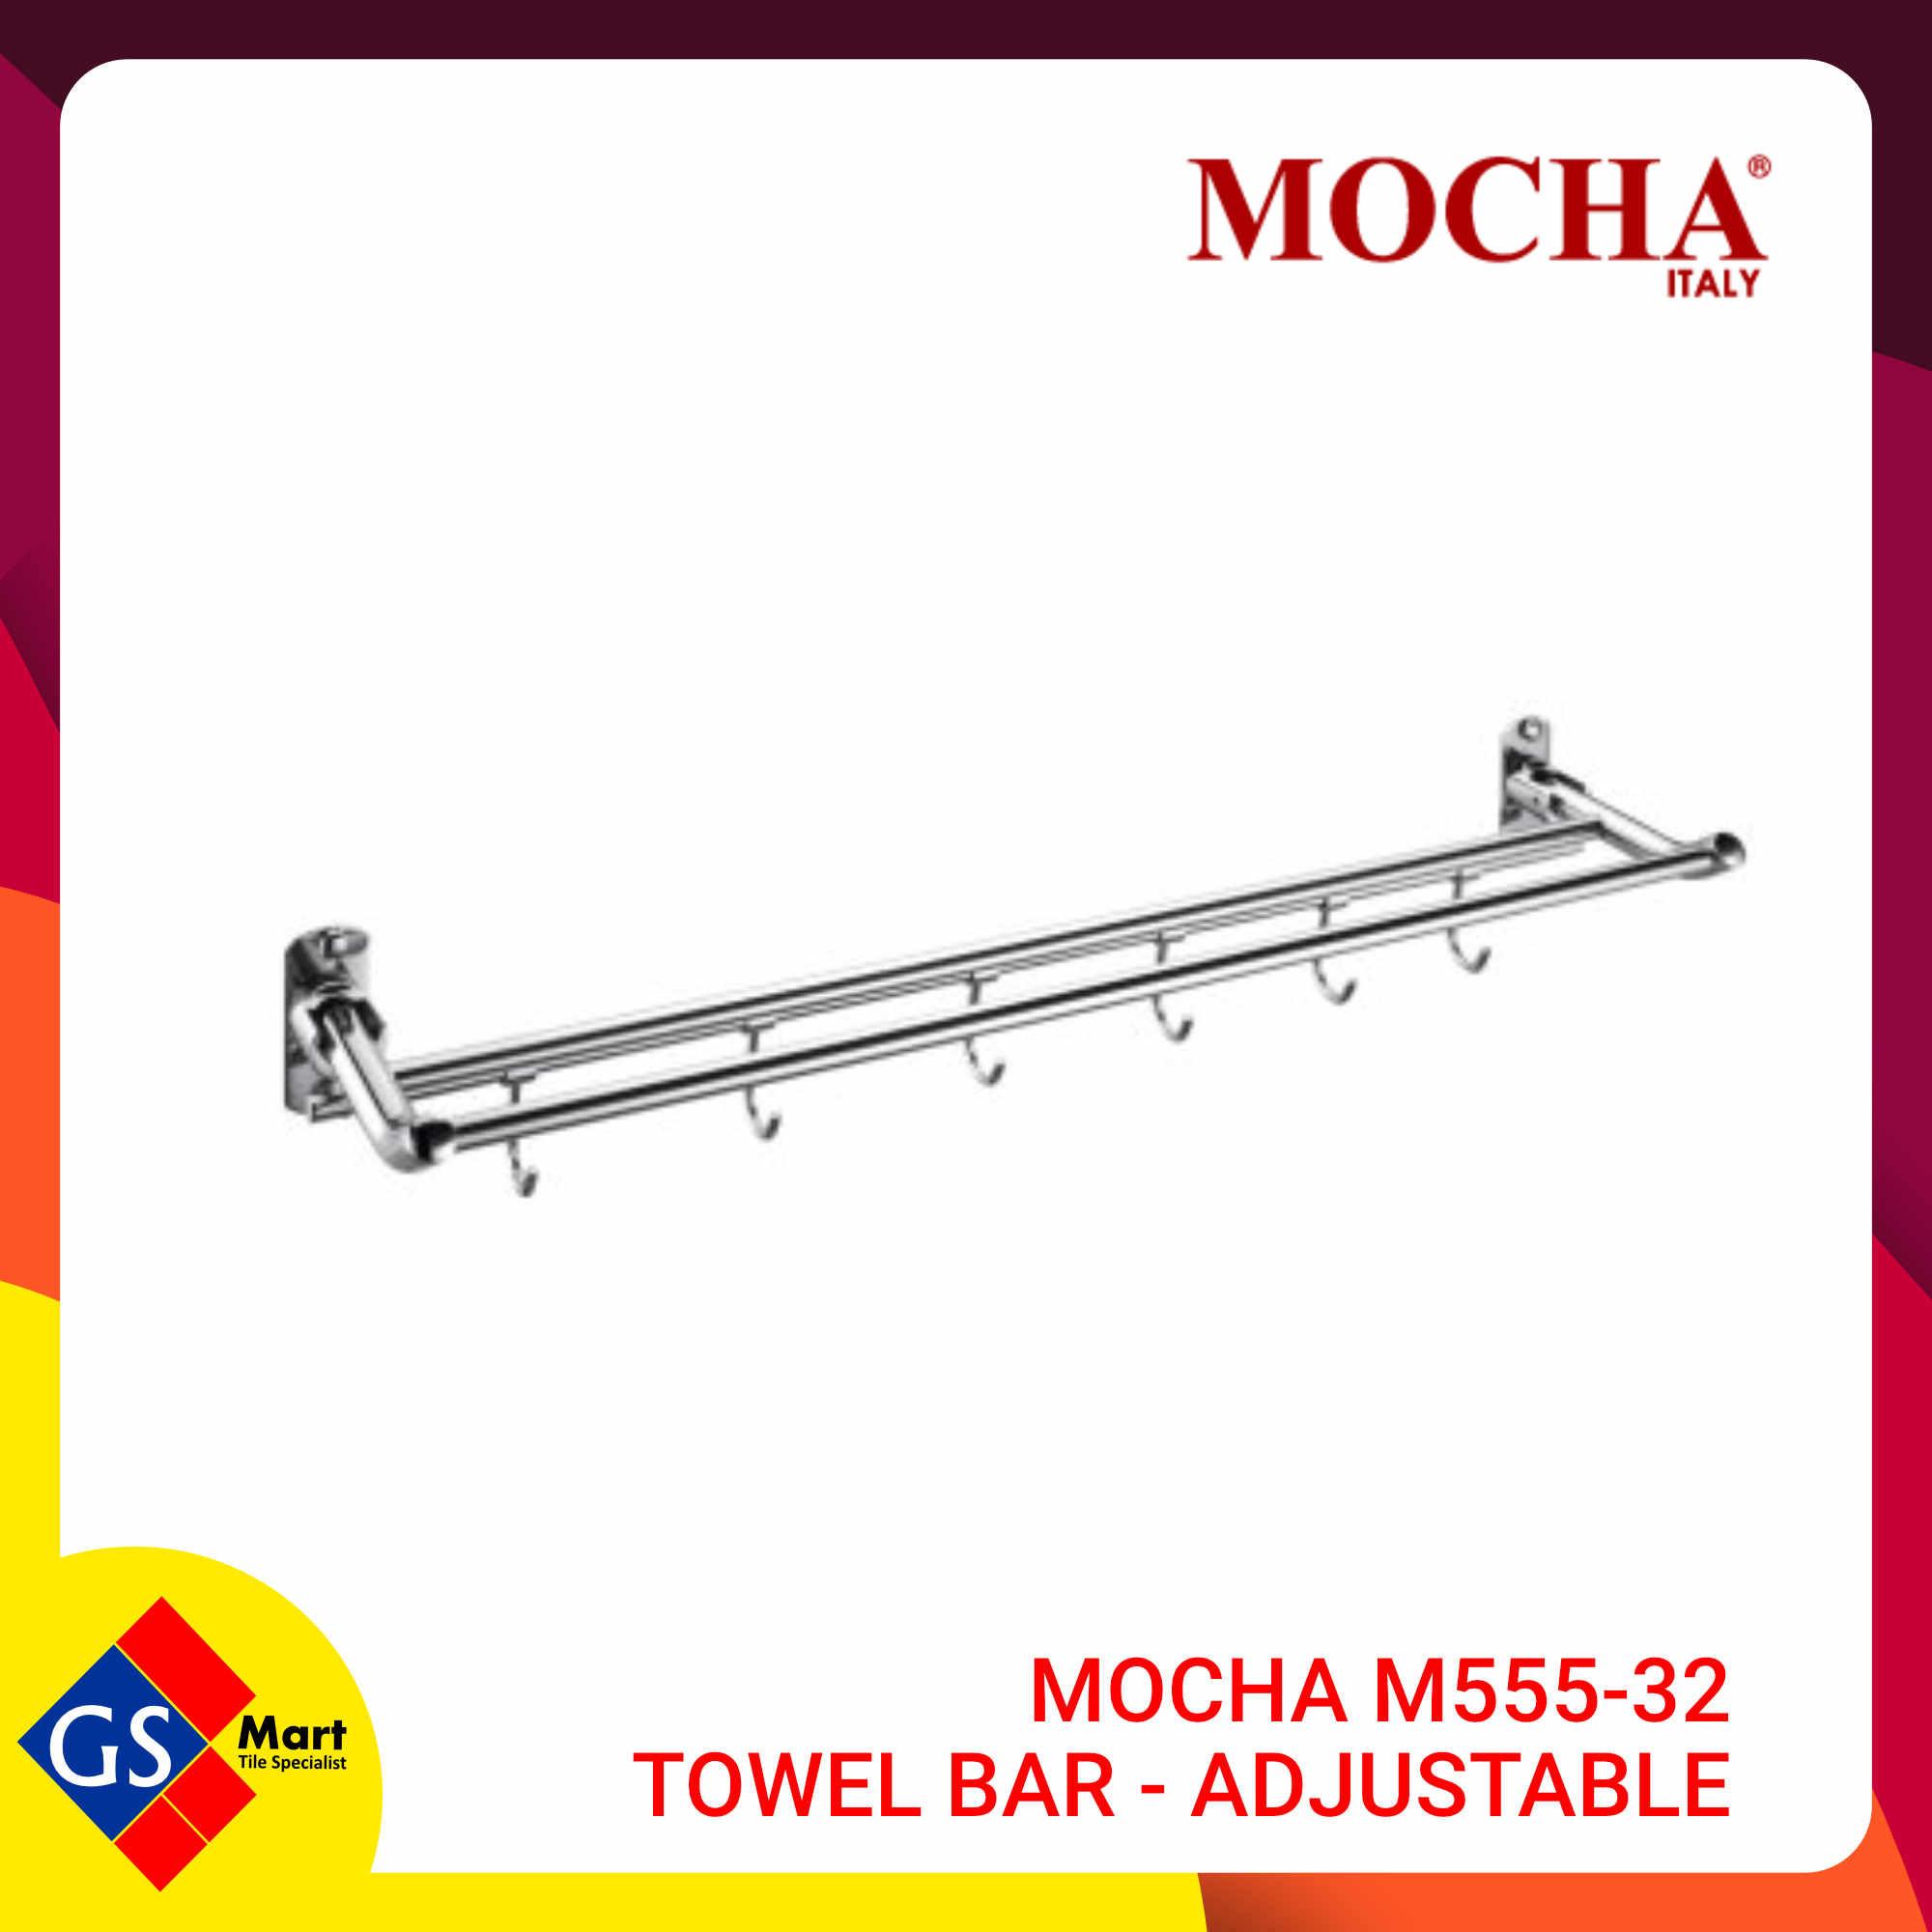 image of MOCHA M555-32 TOWEL BAR - Adjustable